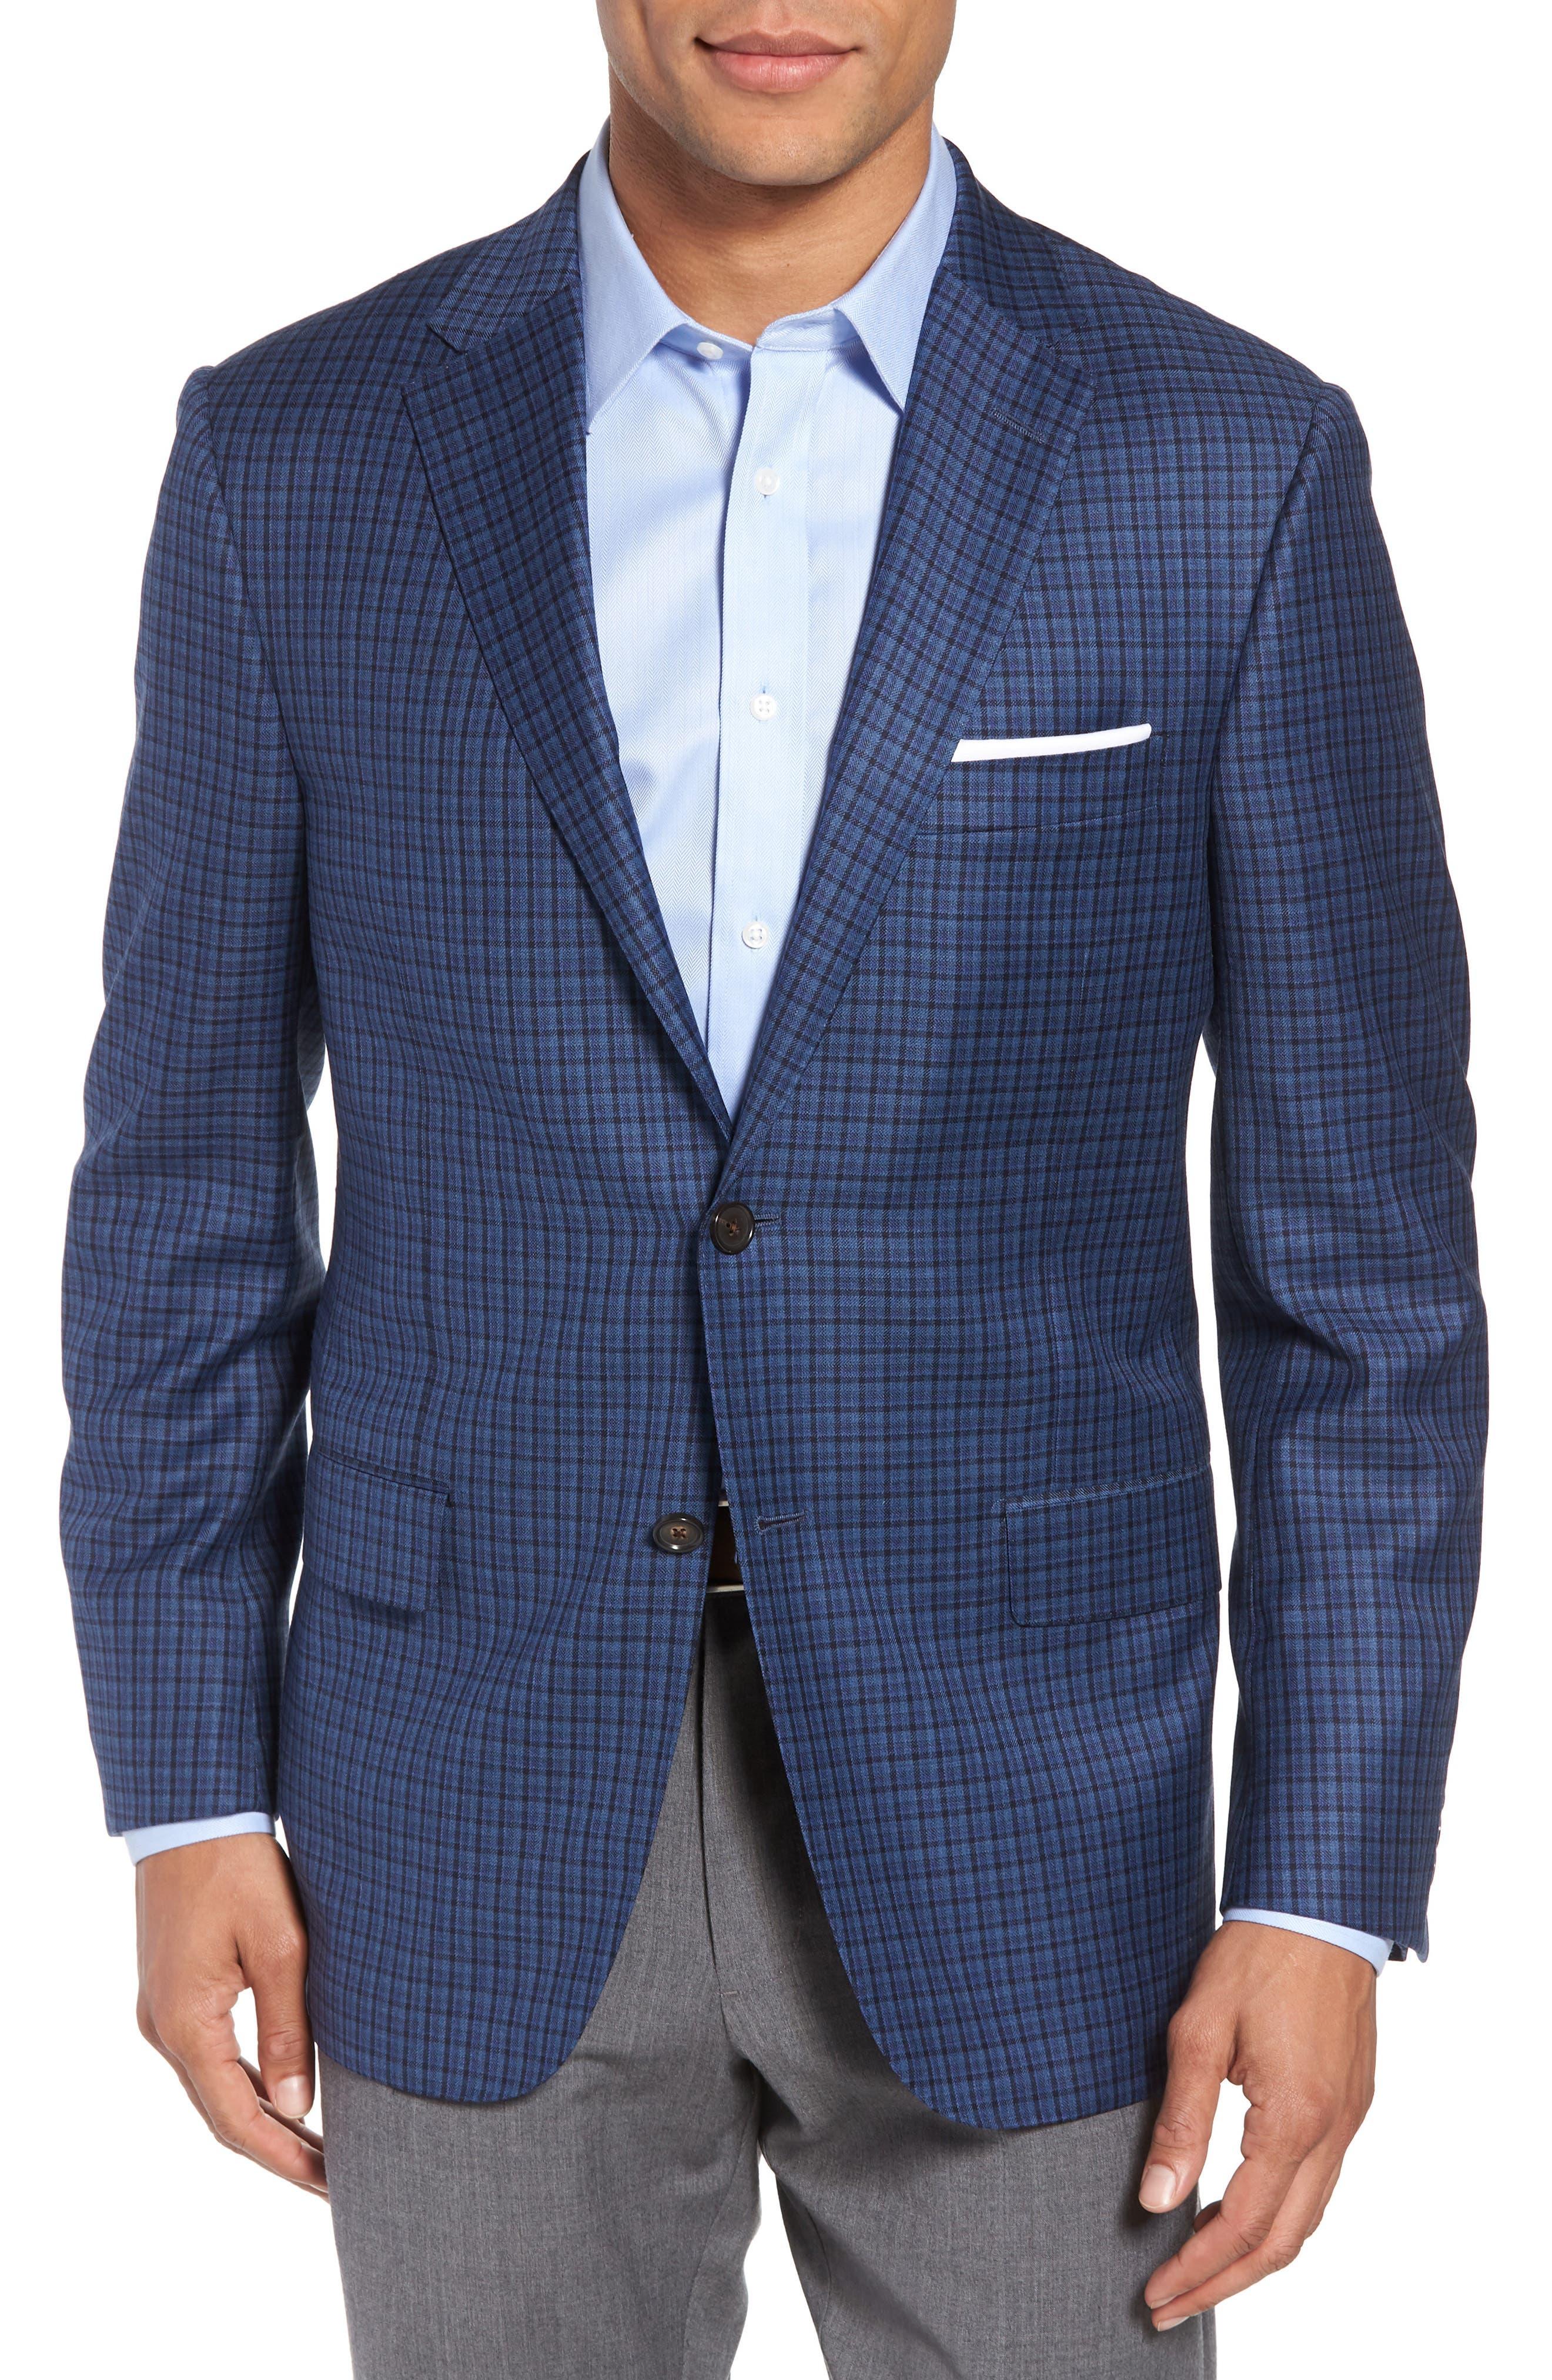 Main Image - Hickey Freeman Classic B Fit Check Wool Sport Coat